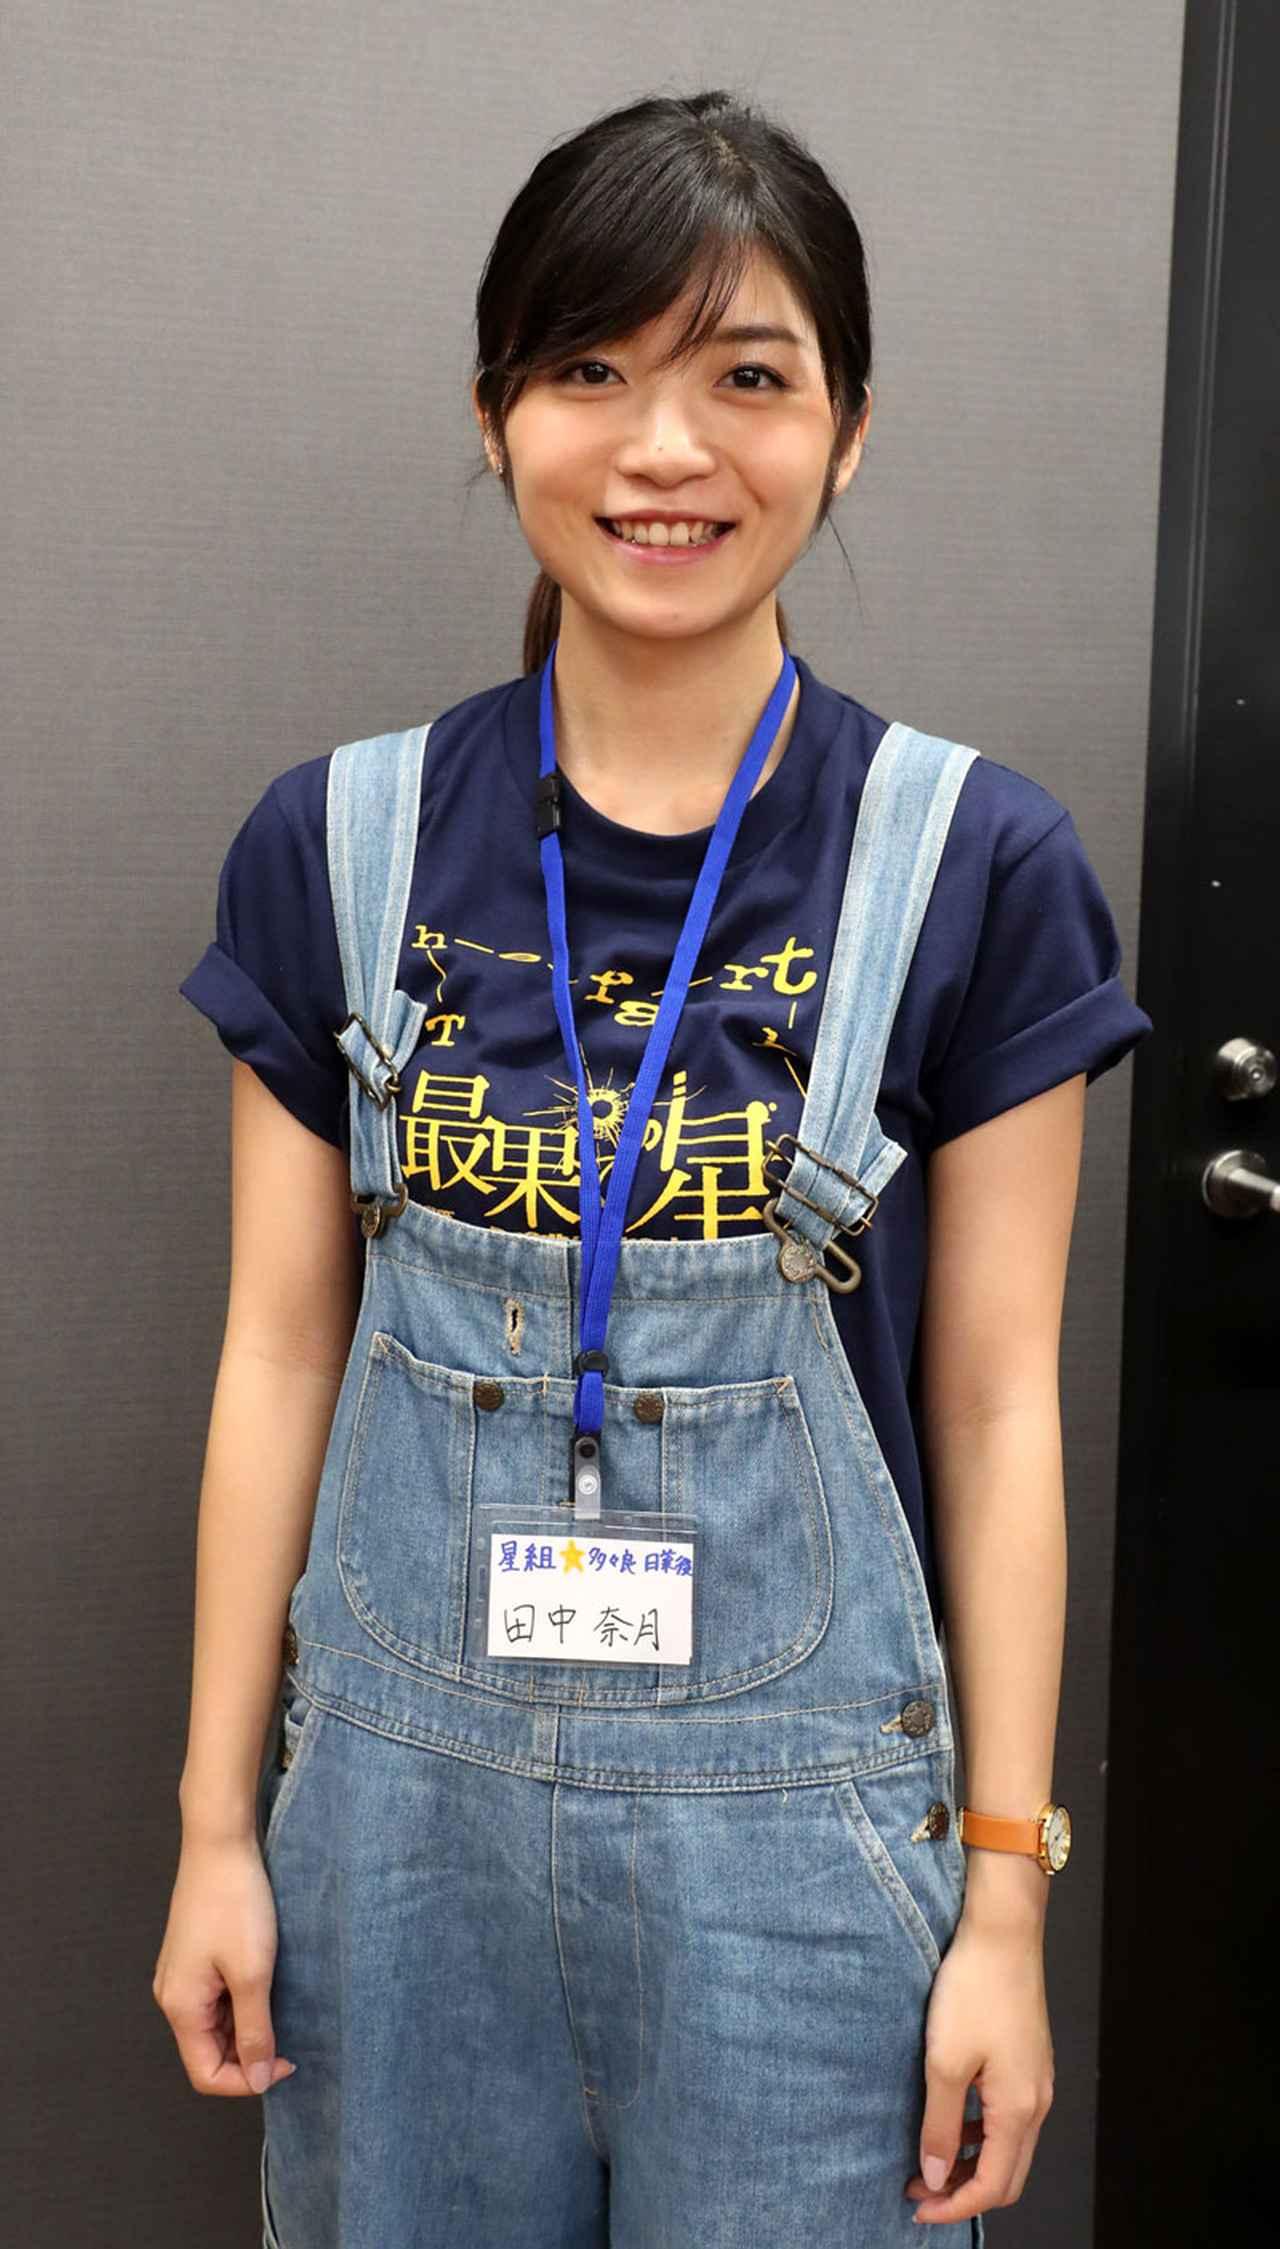 Images : 6番目の画像 - 「田中奈月/将来有望な若手女優の中でも大注目の一人が、アリスインプロジェクト最新作で印象に残る役を熱演!」のアルバム - Stereo Sound ONLINE